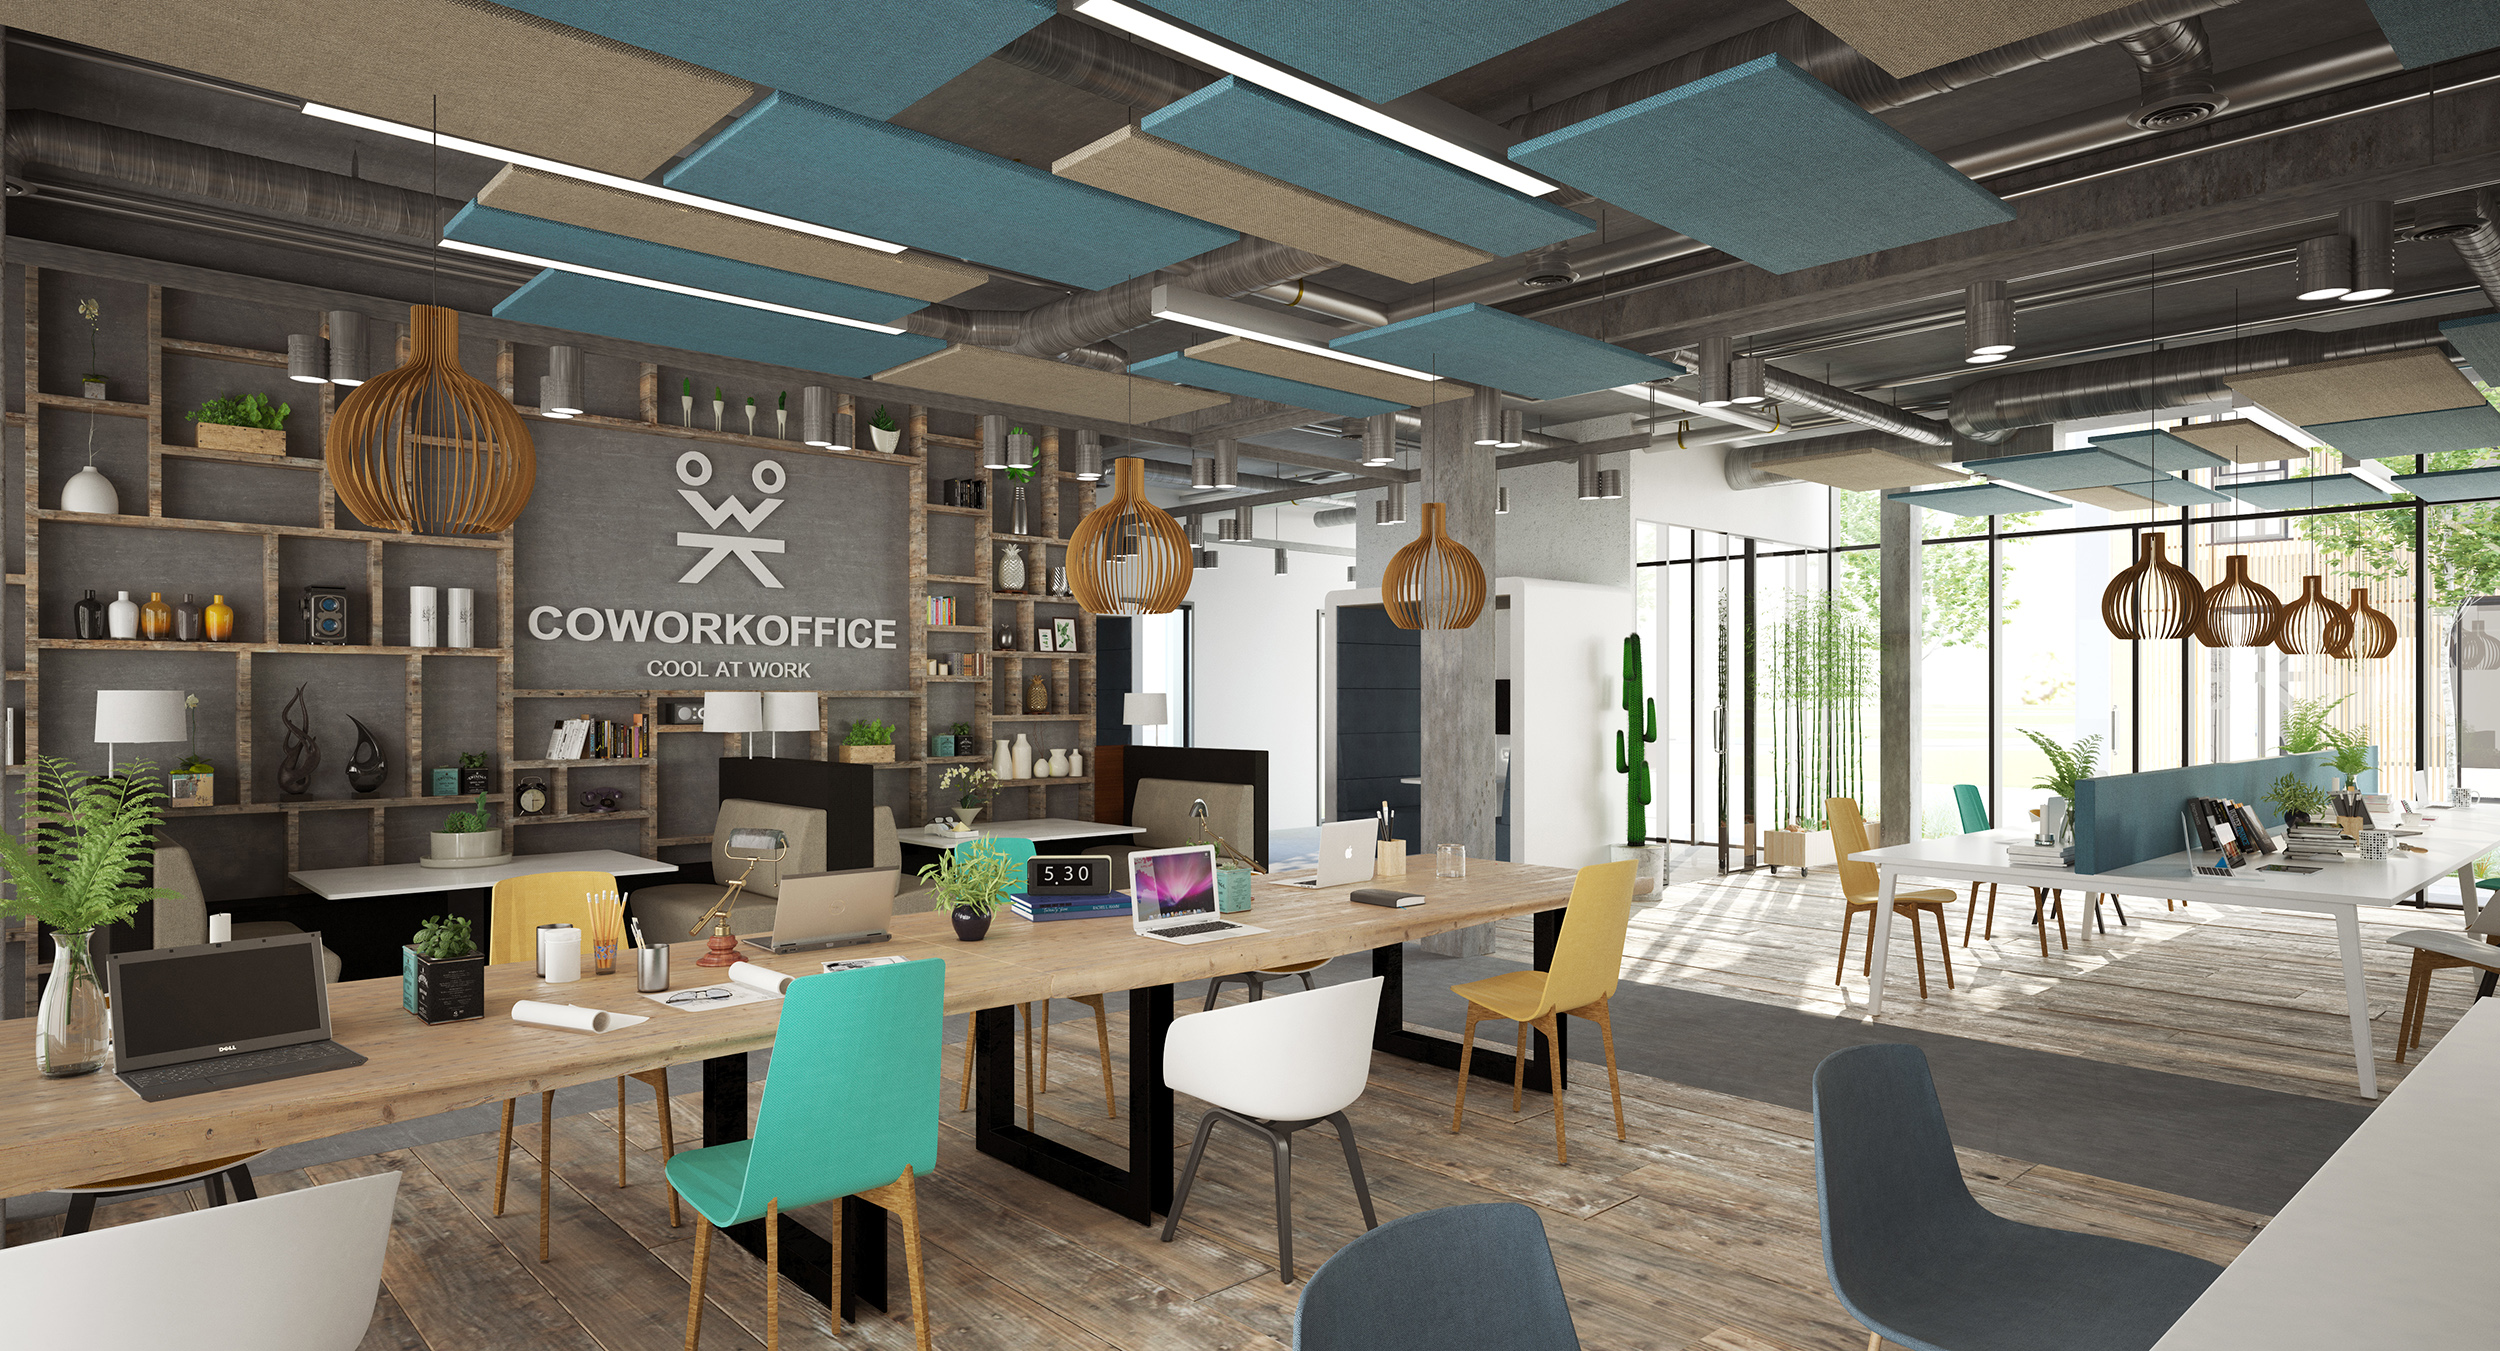 avril 2018 ouverture de coworkoffice 1er espace de coworking du groupe artea artea groupe. Black Bedroom Furniture Sets. Home Design Ideas